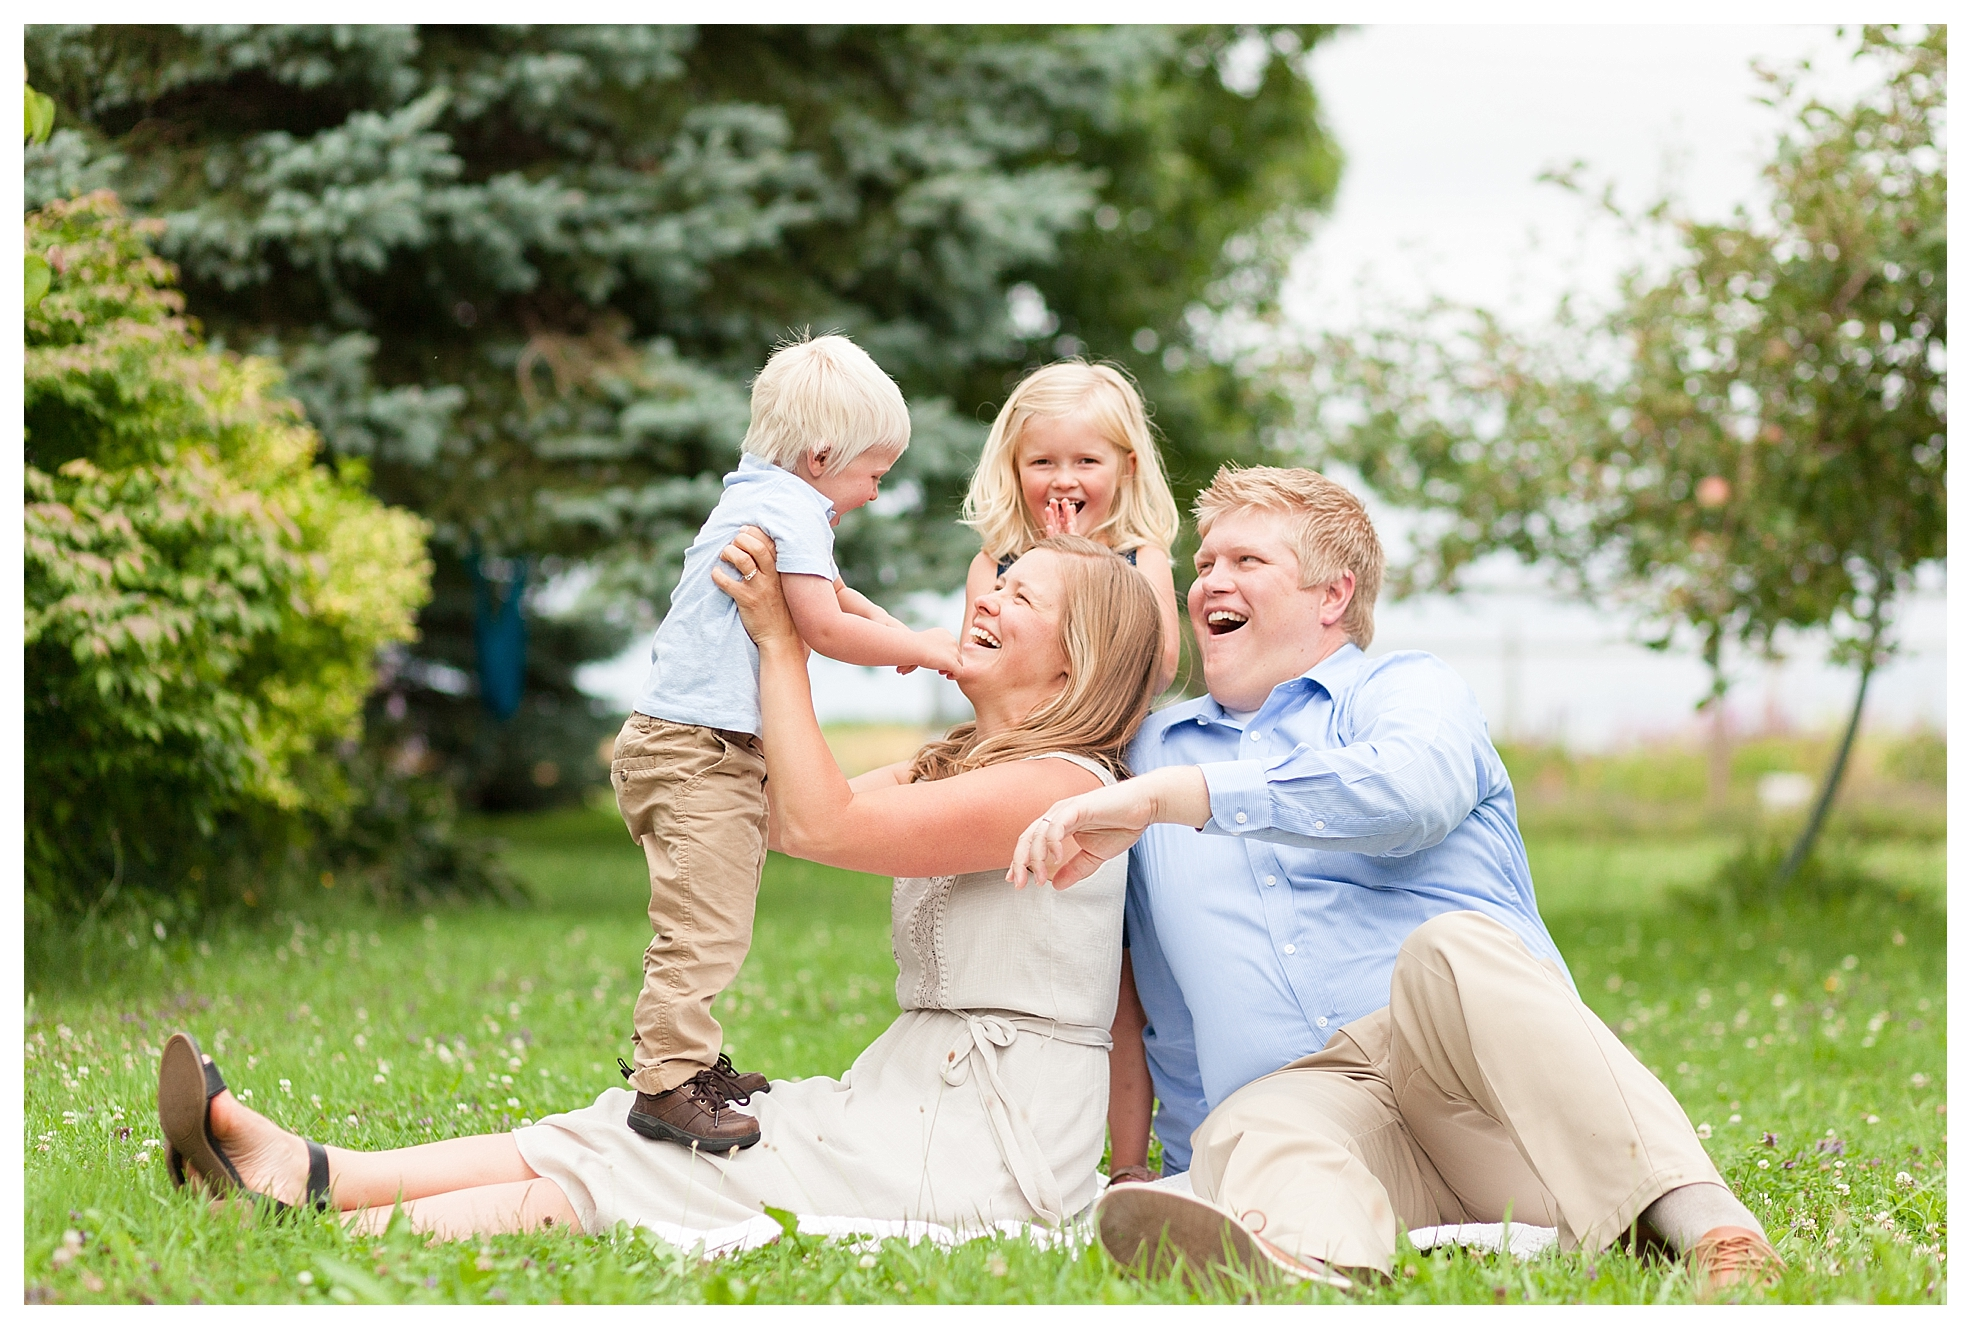 Houghton County Family Photographer_0087.jpg